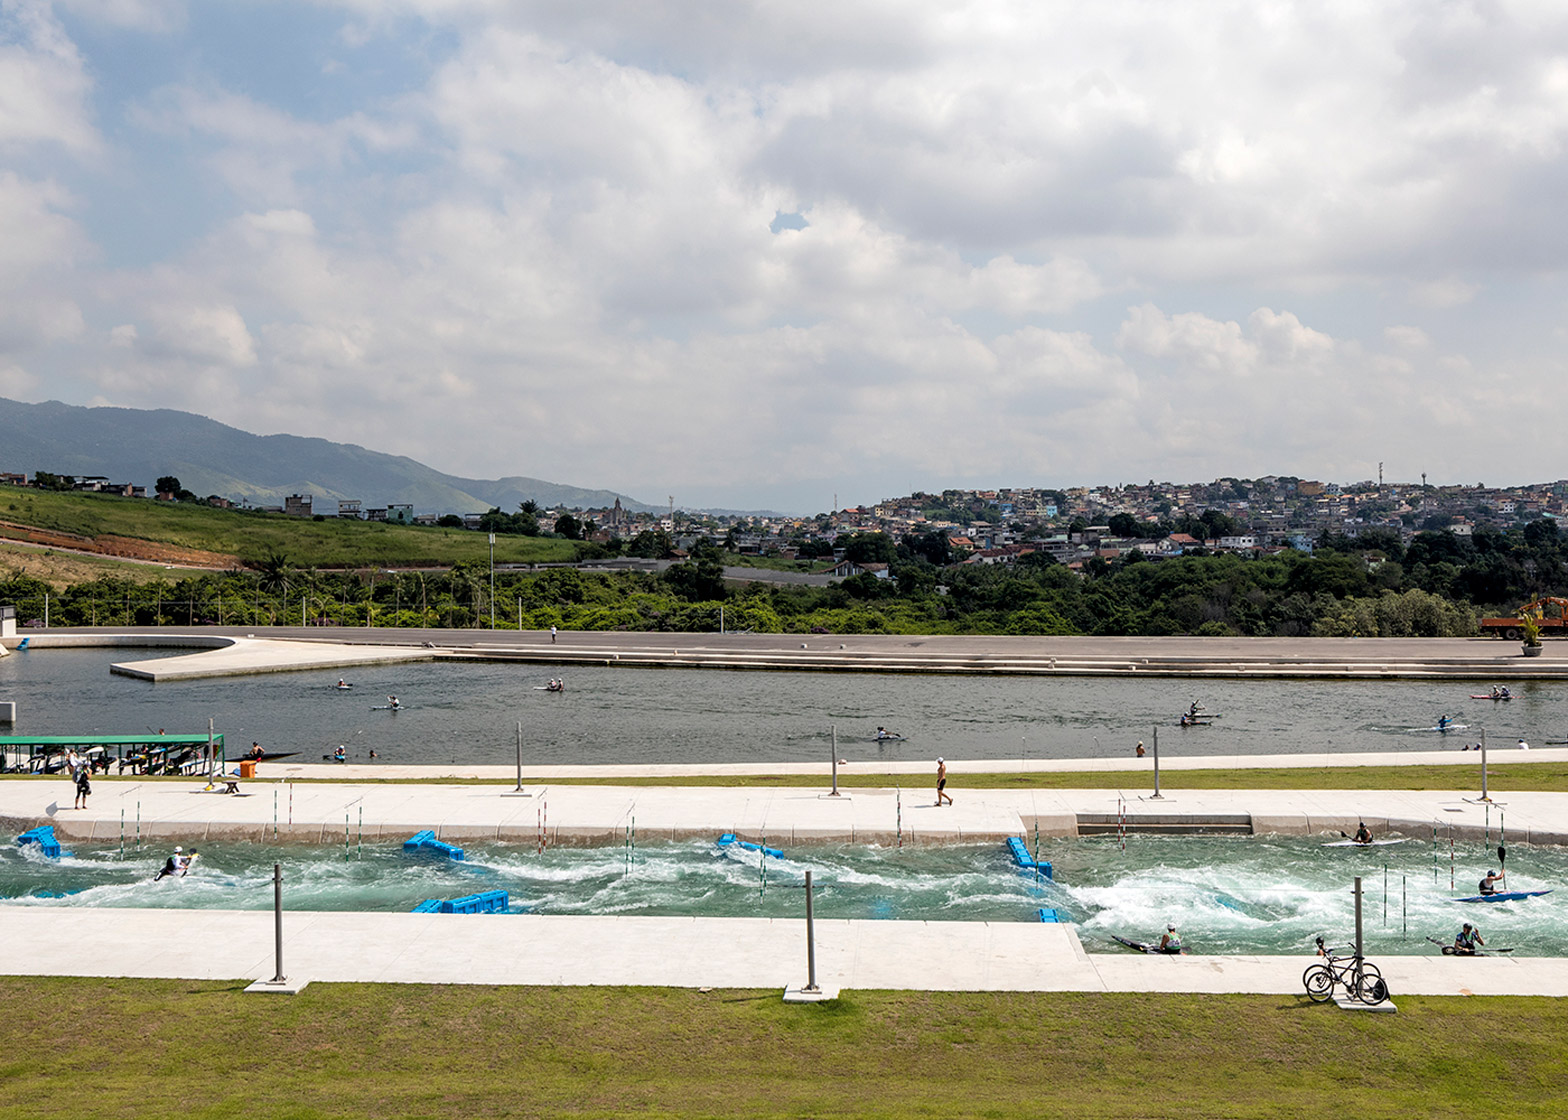 Canoe Slalom course, Deodoro Olympic Park, by Vigliecca & Associados